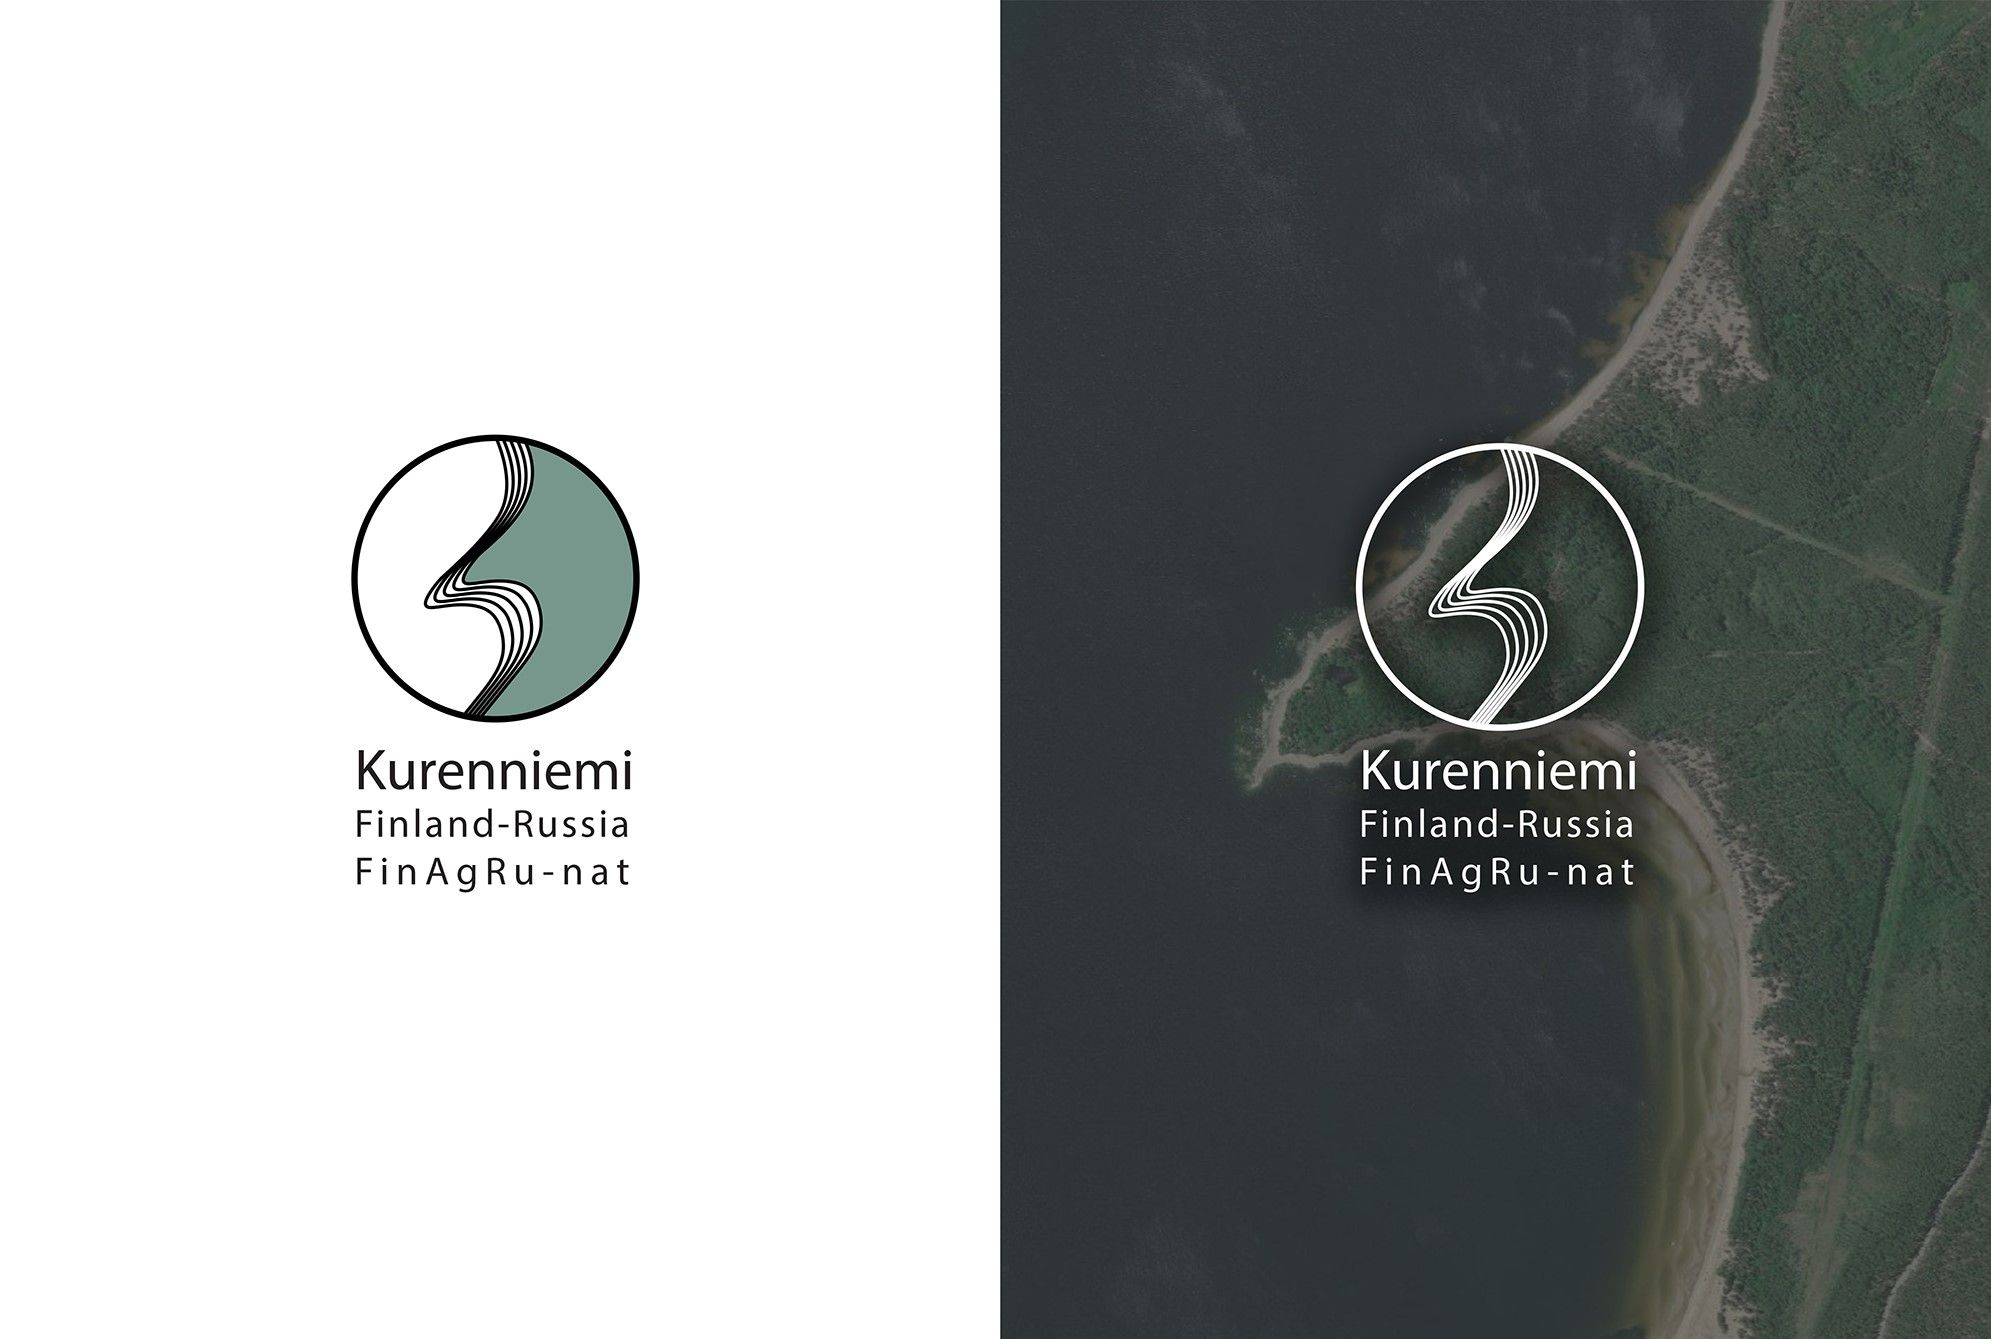 Логотип для Kurenniemi, FinAgRu-nat, Finland-Russia - дизайнер Khan